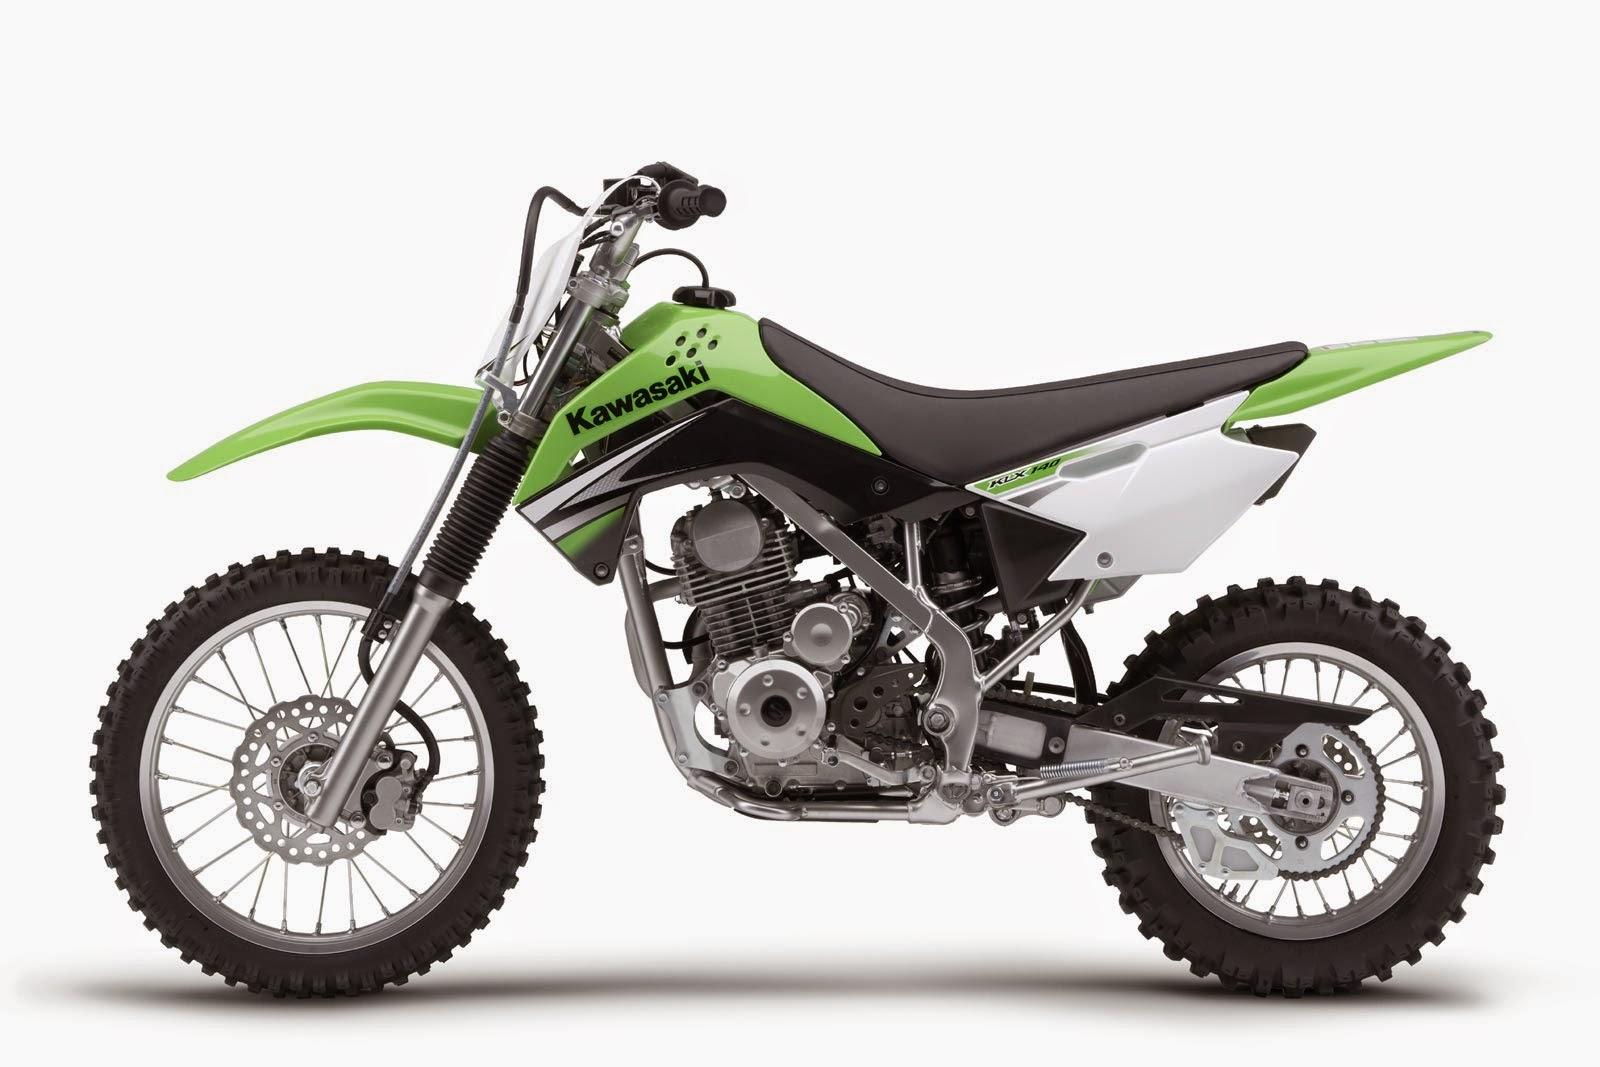 Motor Trail Klx 250 Modifikasi Modifikasi Kawasaki Trail Klx